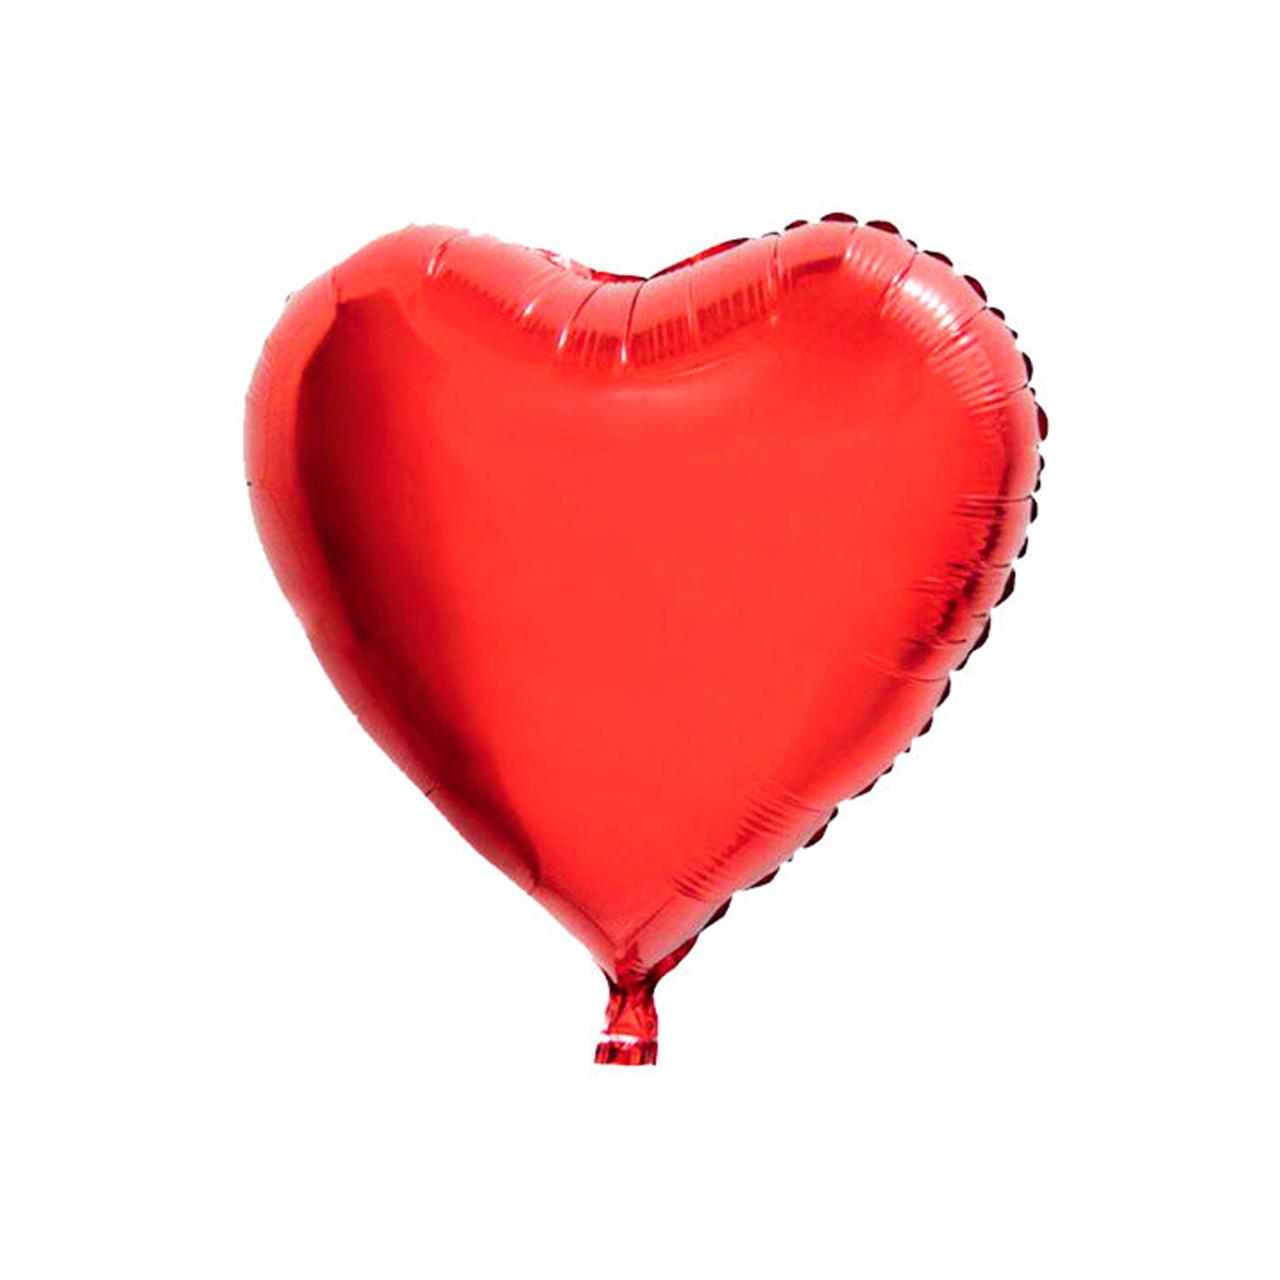 بادکنک فویلی طرح قلب سایز 45 × 45 سانتی متر سایز 150